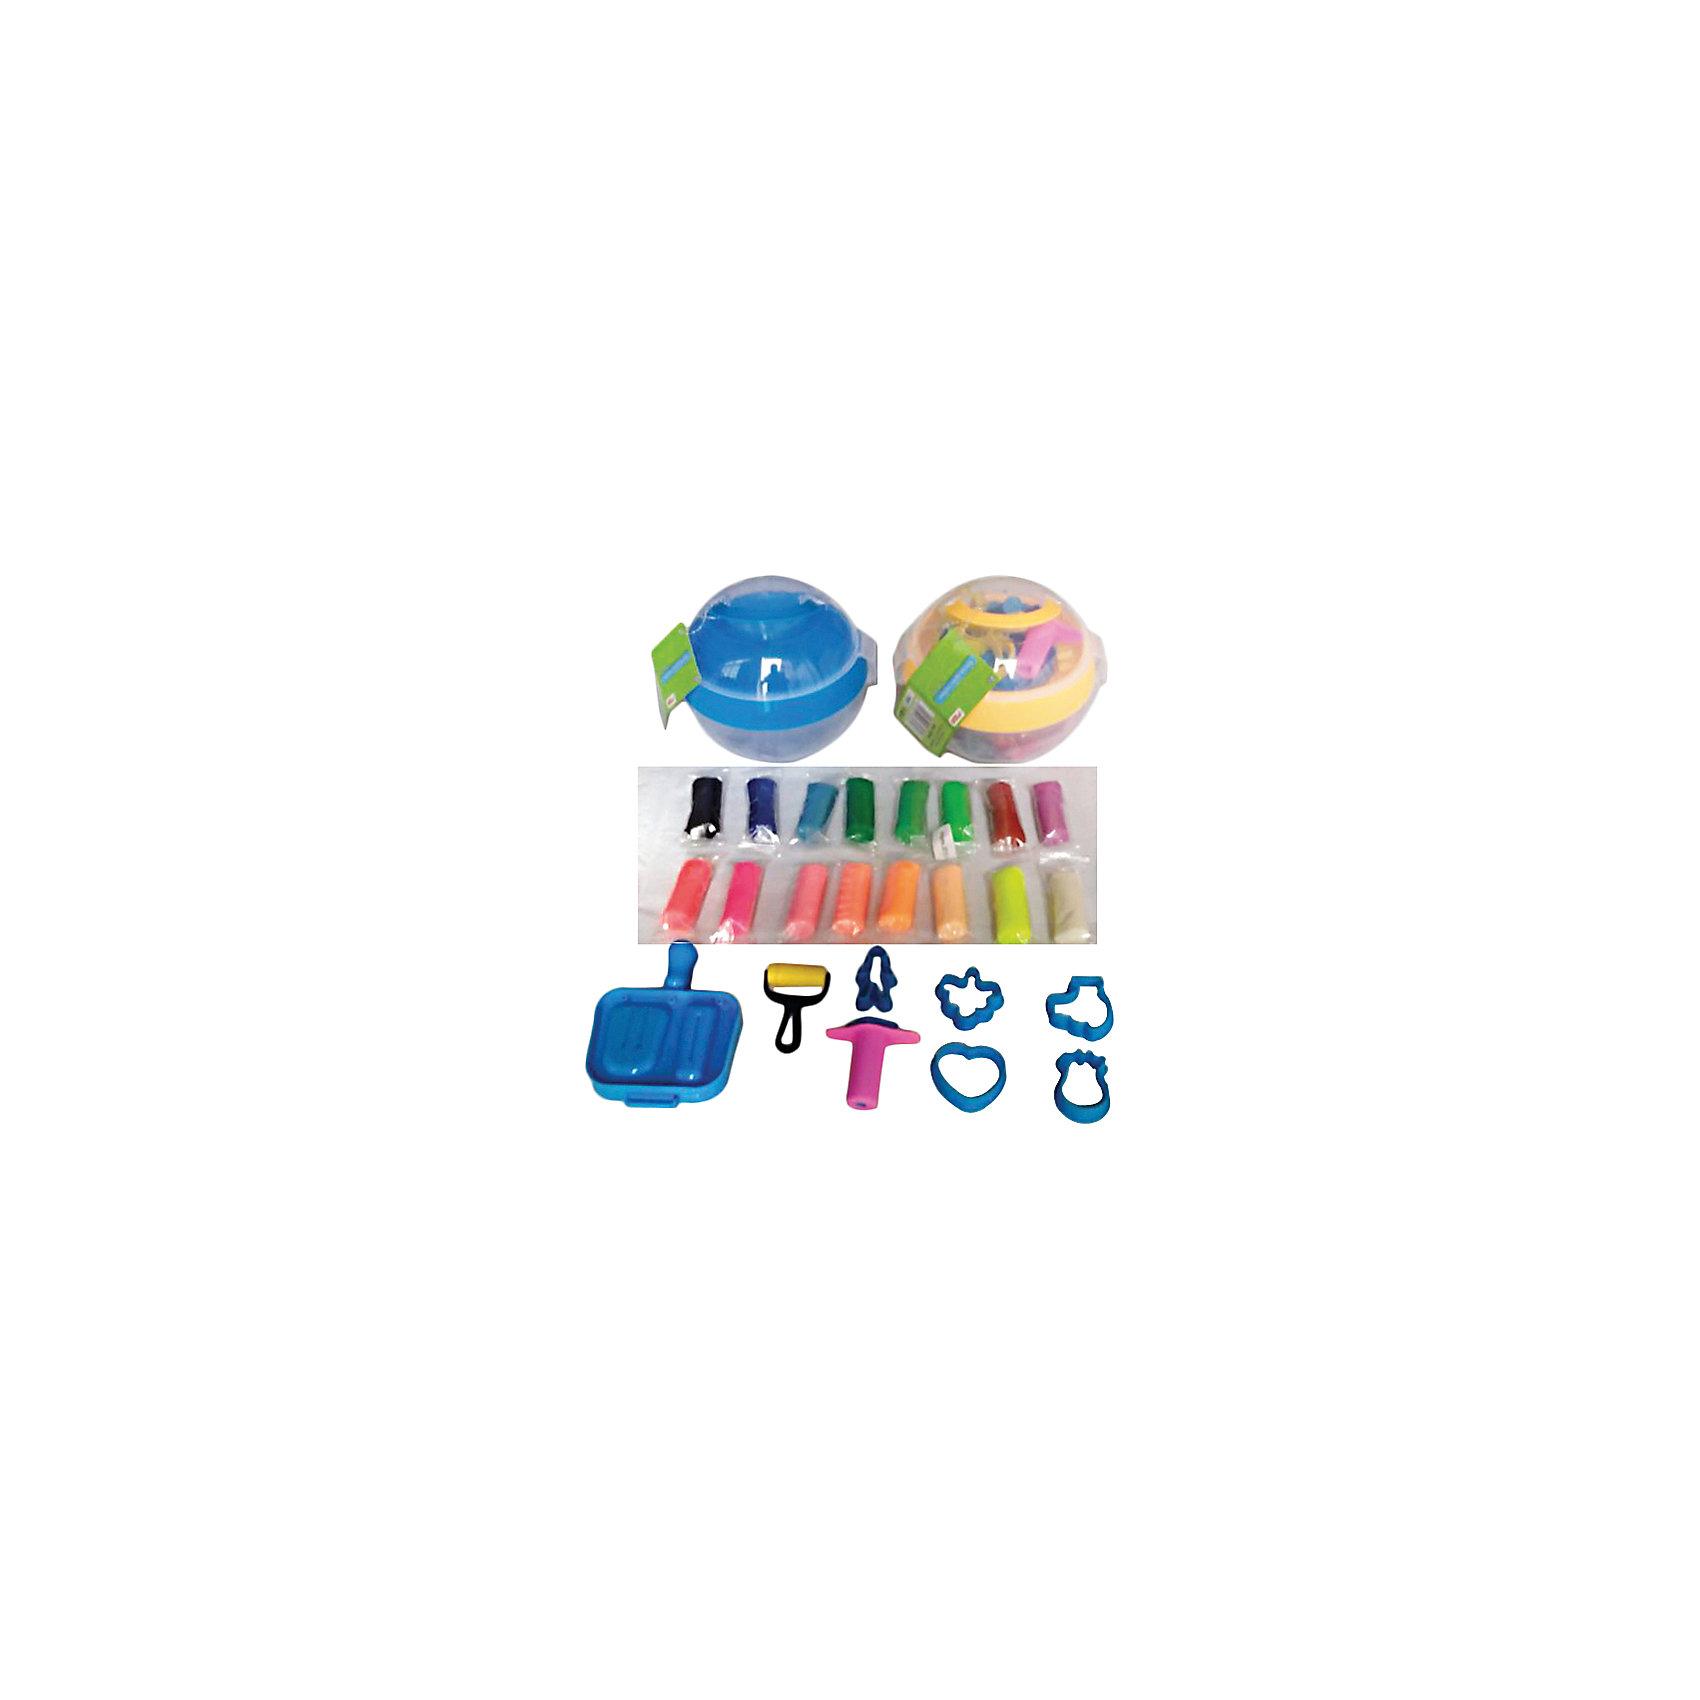 Color Puppy Тесто для лепки: 16 цветов, 272 г, формочки всё для лепки lori пластилин классика 16 цветов